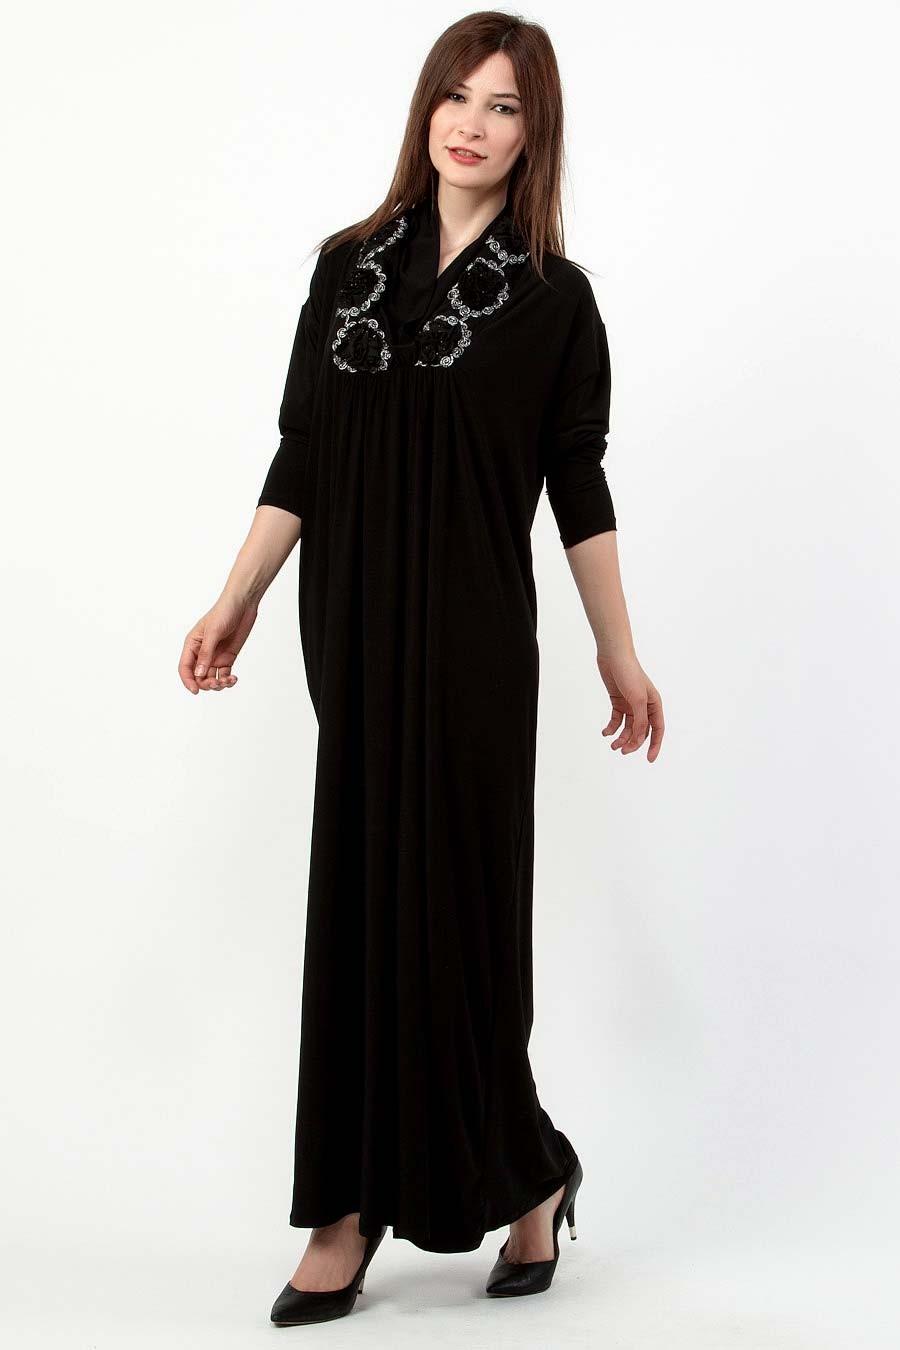 Abaya Designs 2013-14 | Adorable Abaya from Saudia